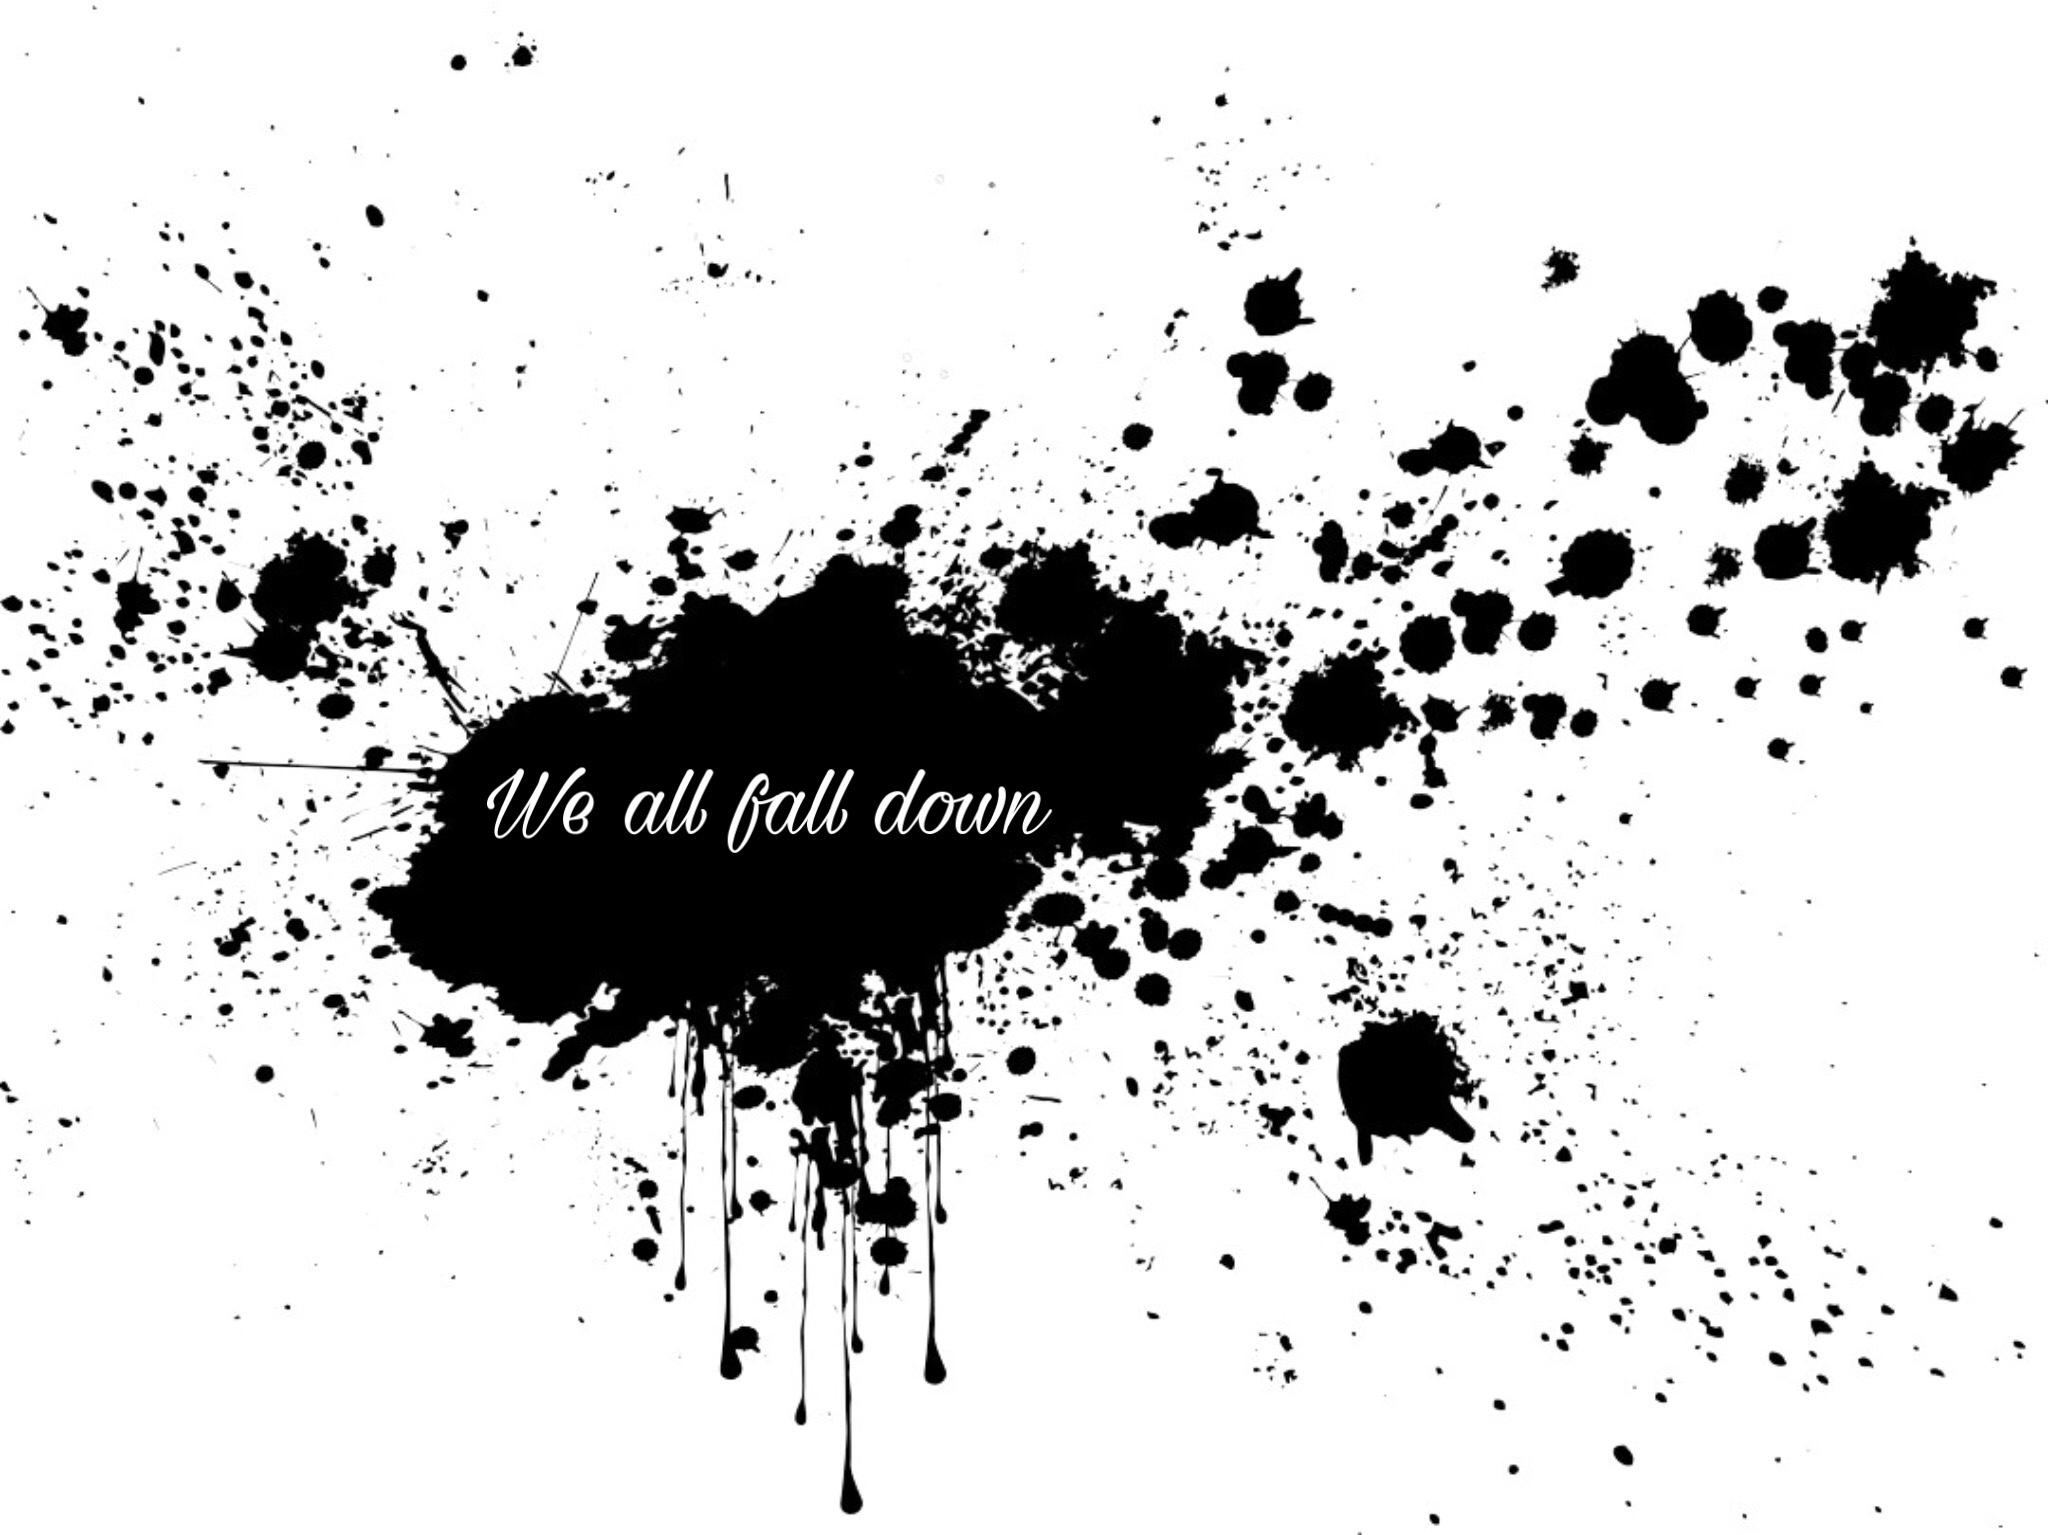 Free falls and failing upward